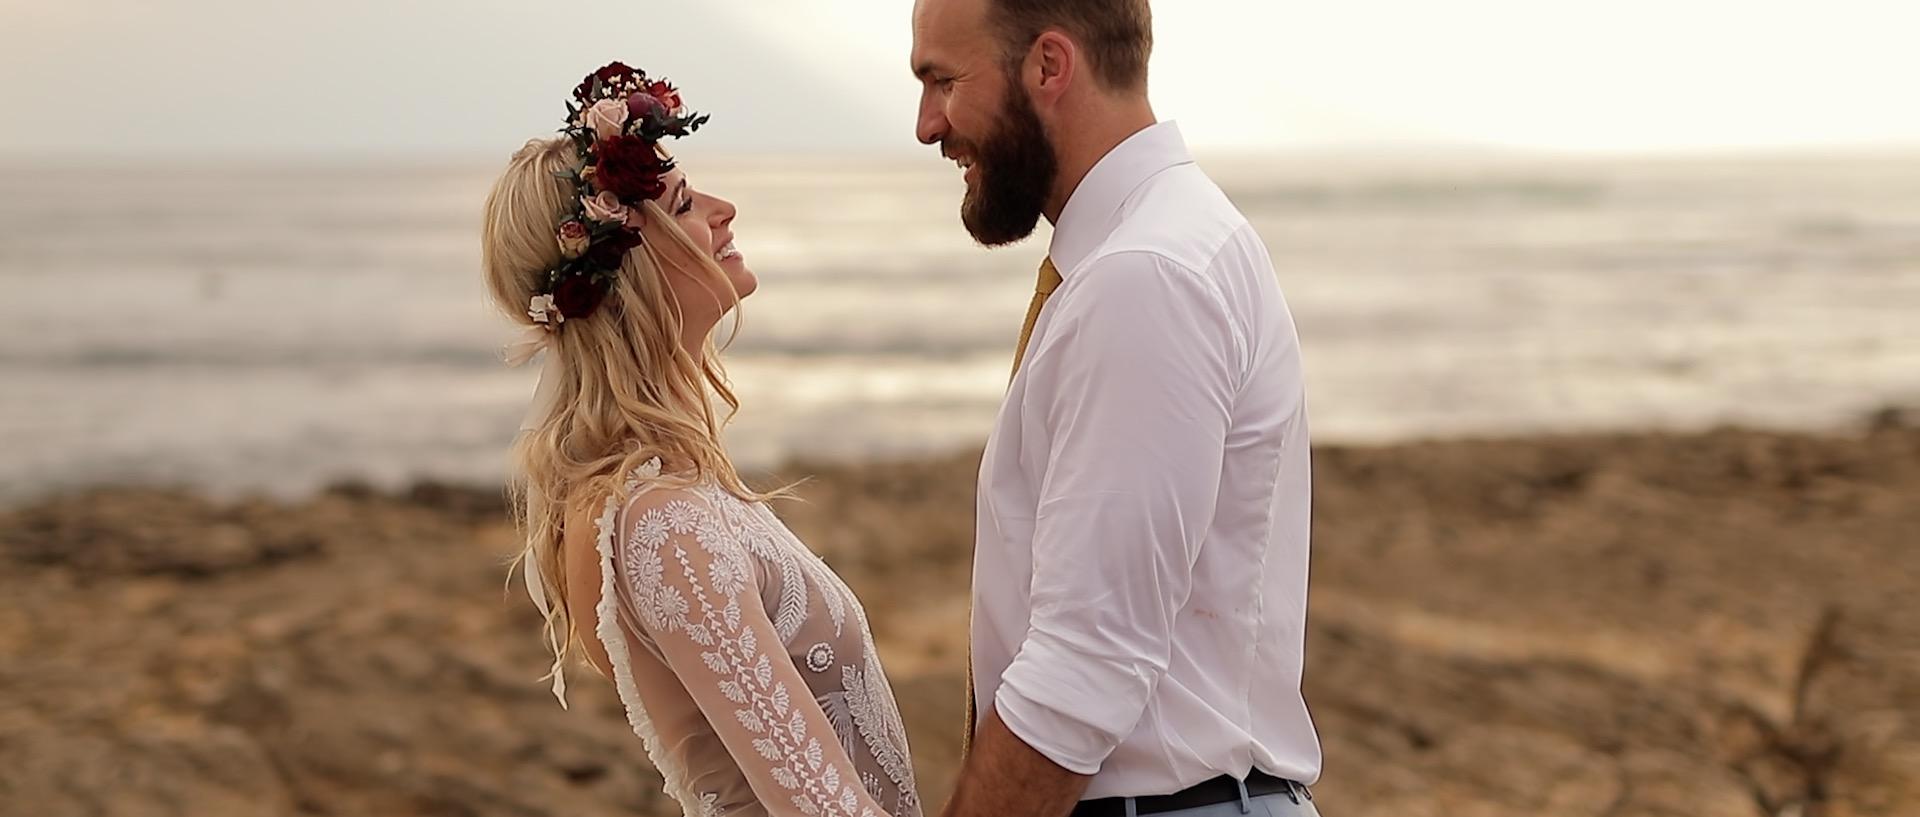 Biarritz wedding videographer